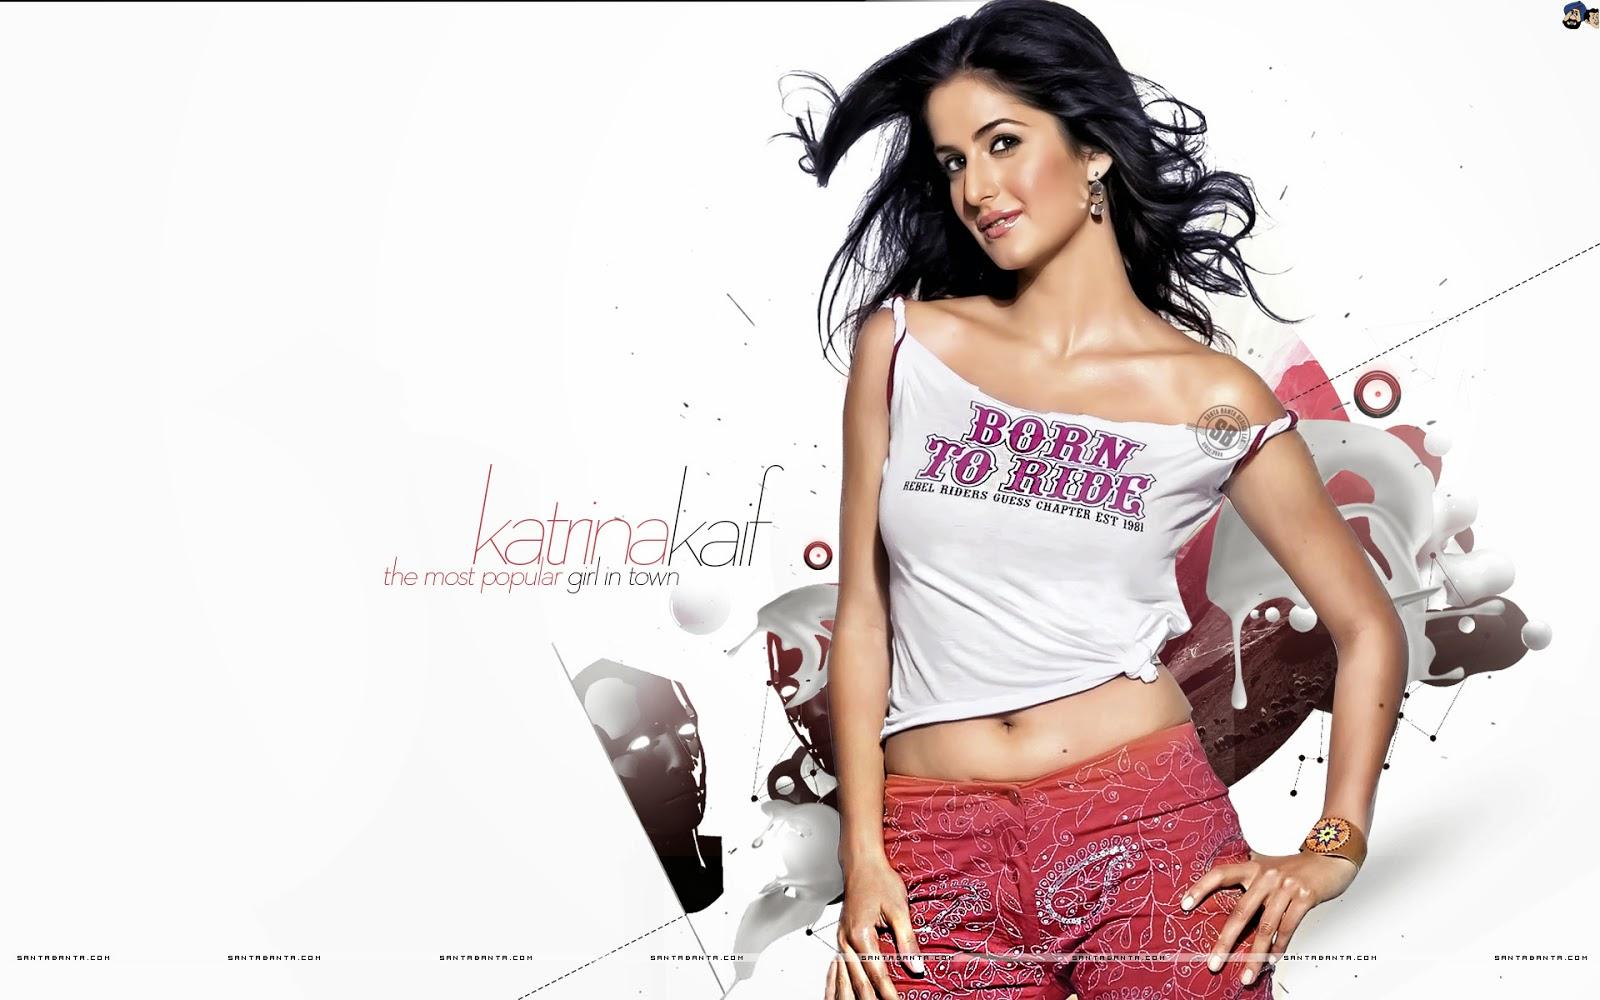 Katrina Kaif Seksi Wallpaper 9